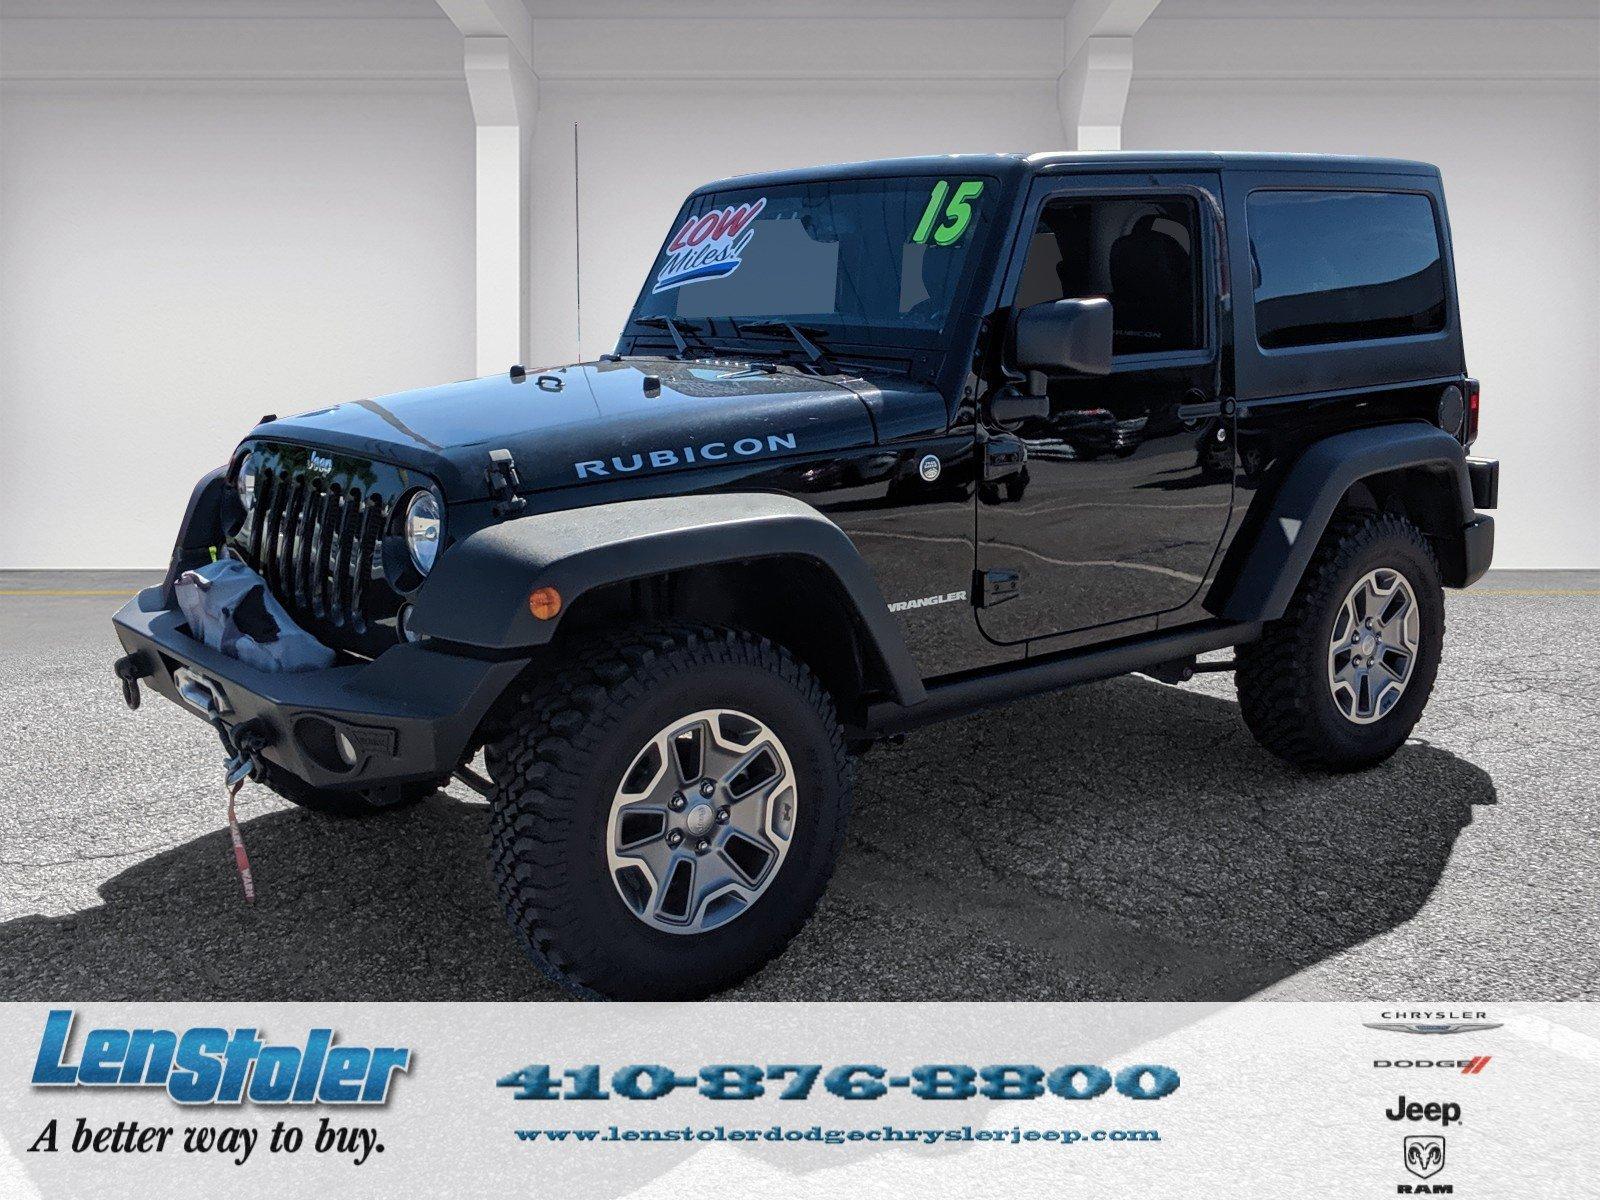 2015 Jeep Wrangler Rubicon SUV